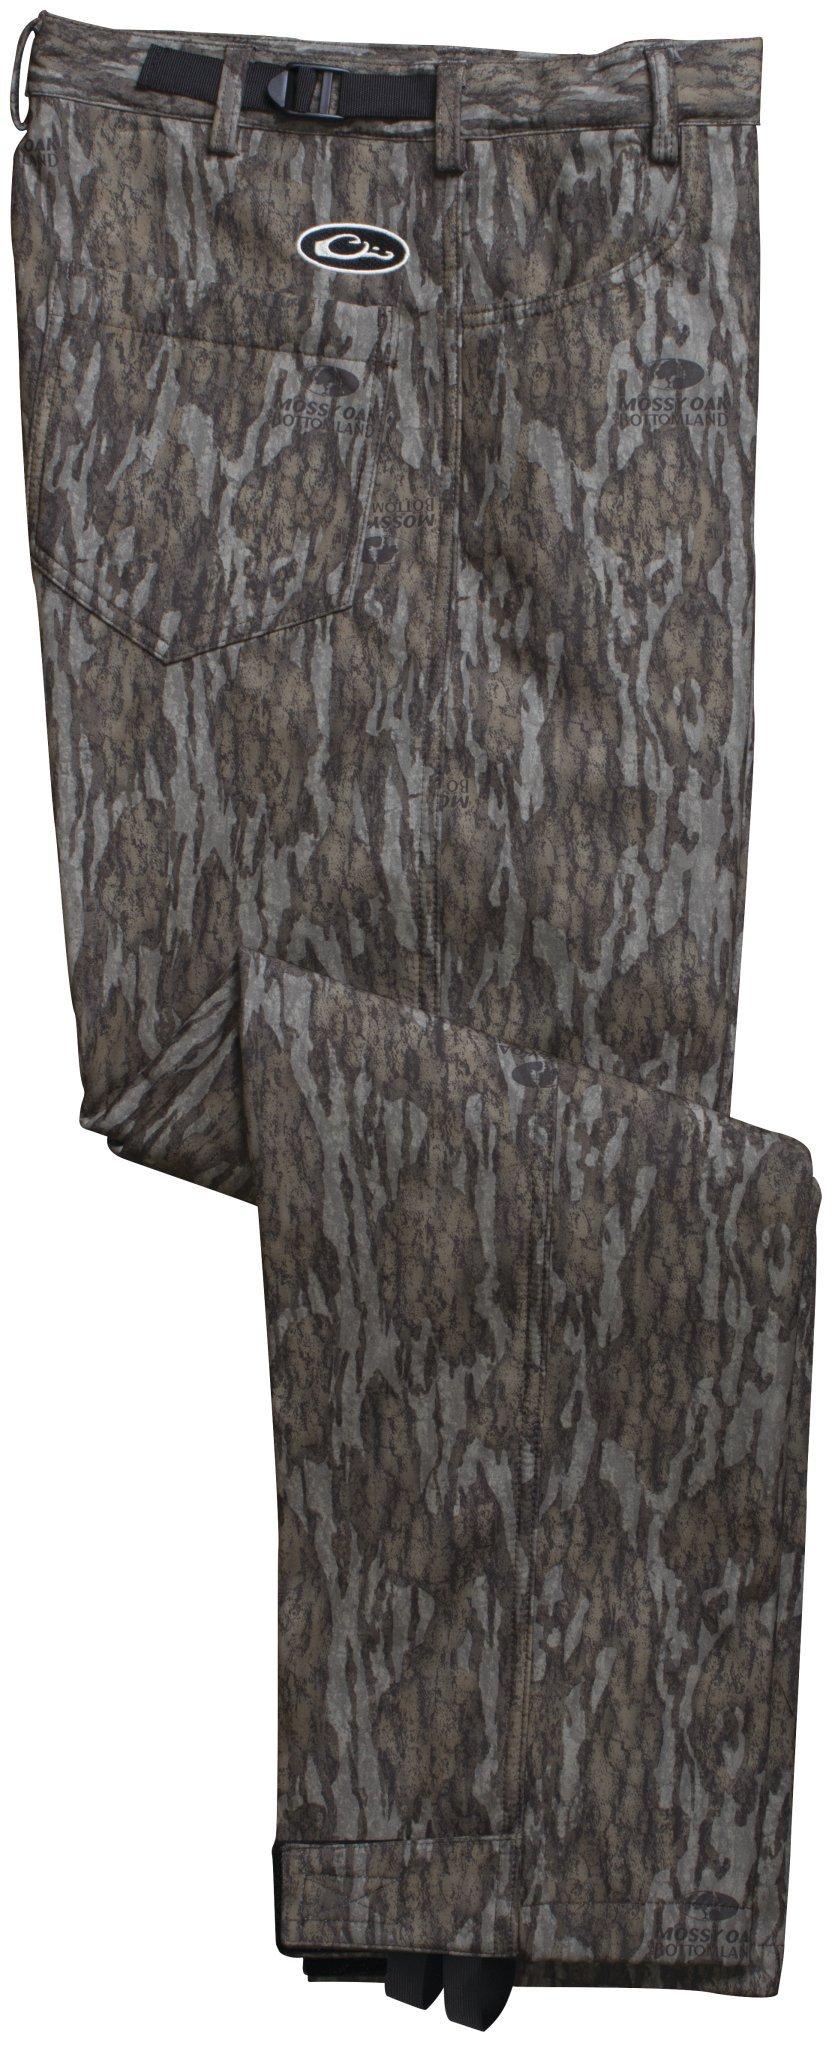 Drake MST Waterproof Mossy Oak Bottomland Bonded Fleece Pant, Small